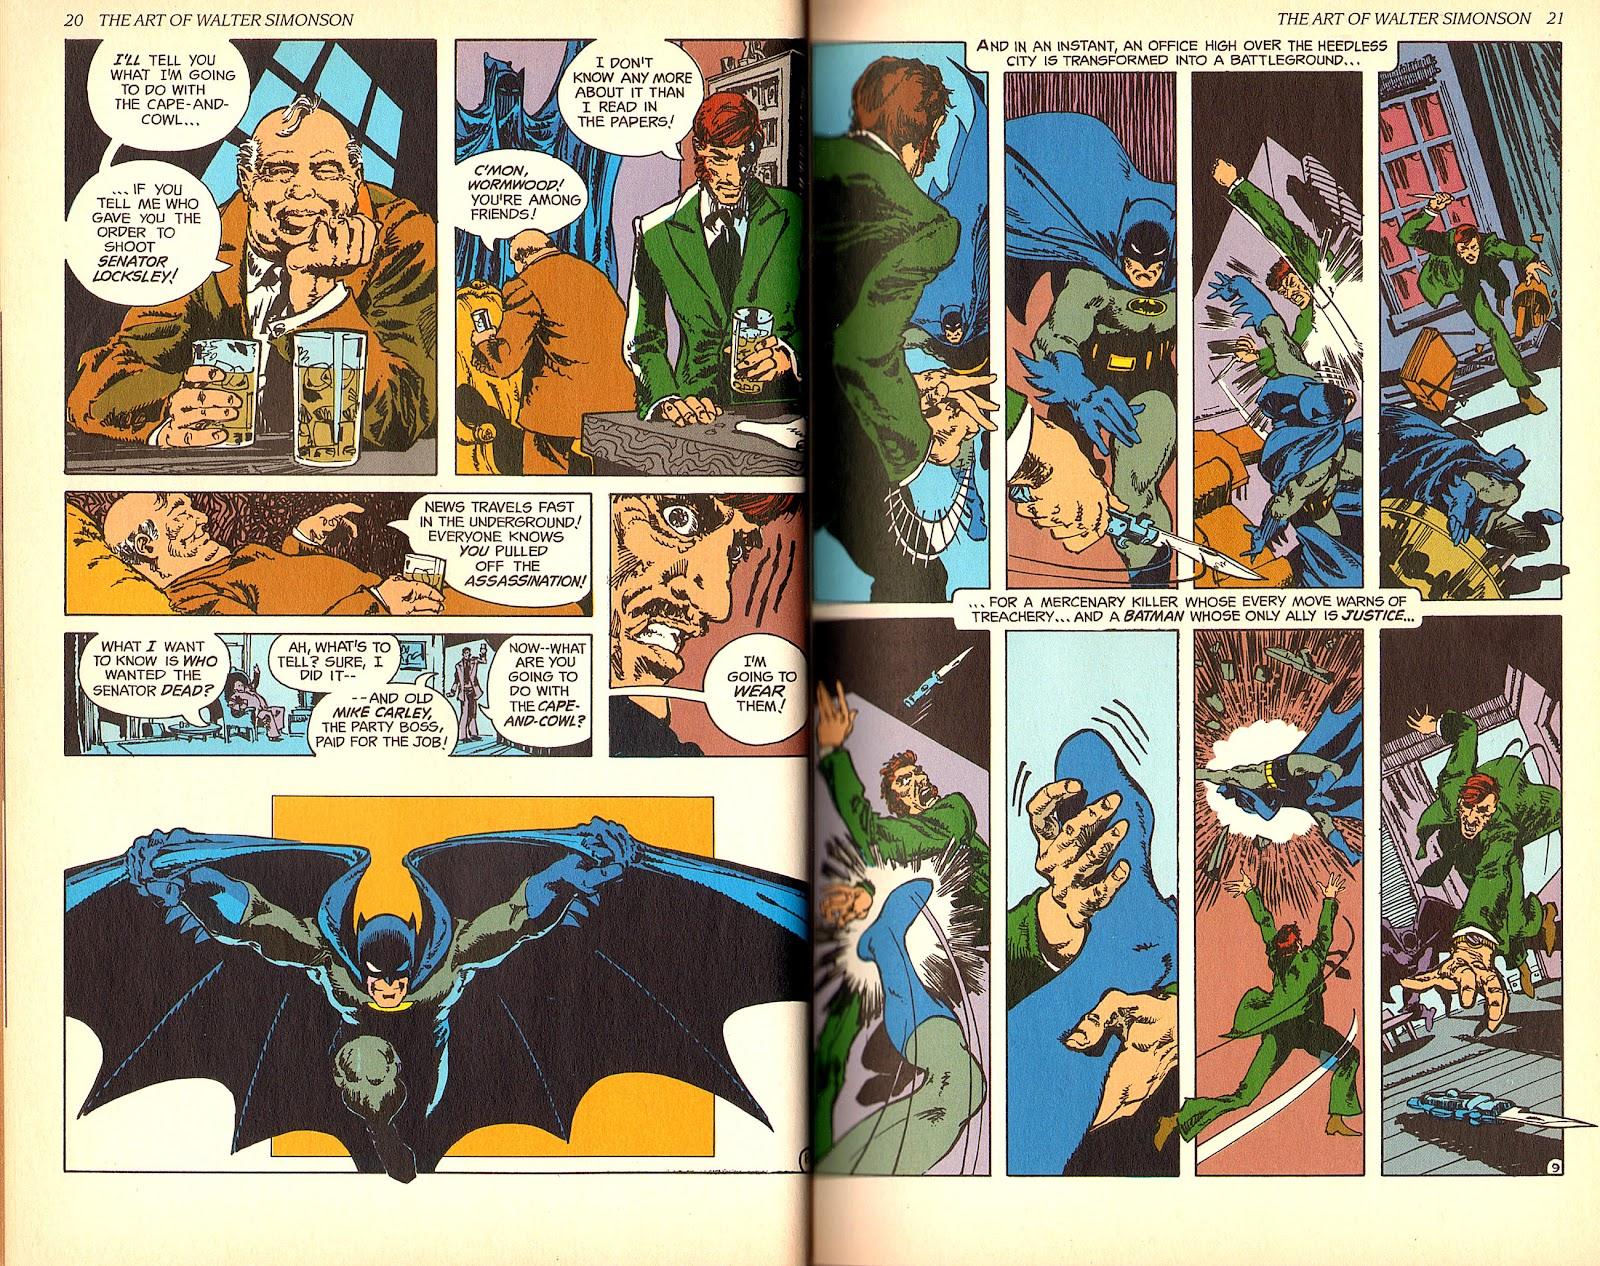 Read online The Art of Walter Simonson comic -  Issue # TPB - 12